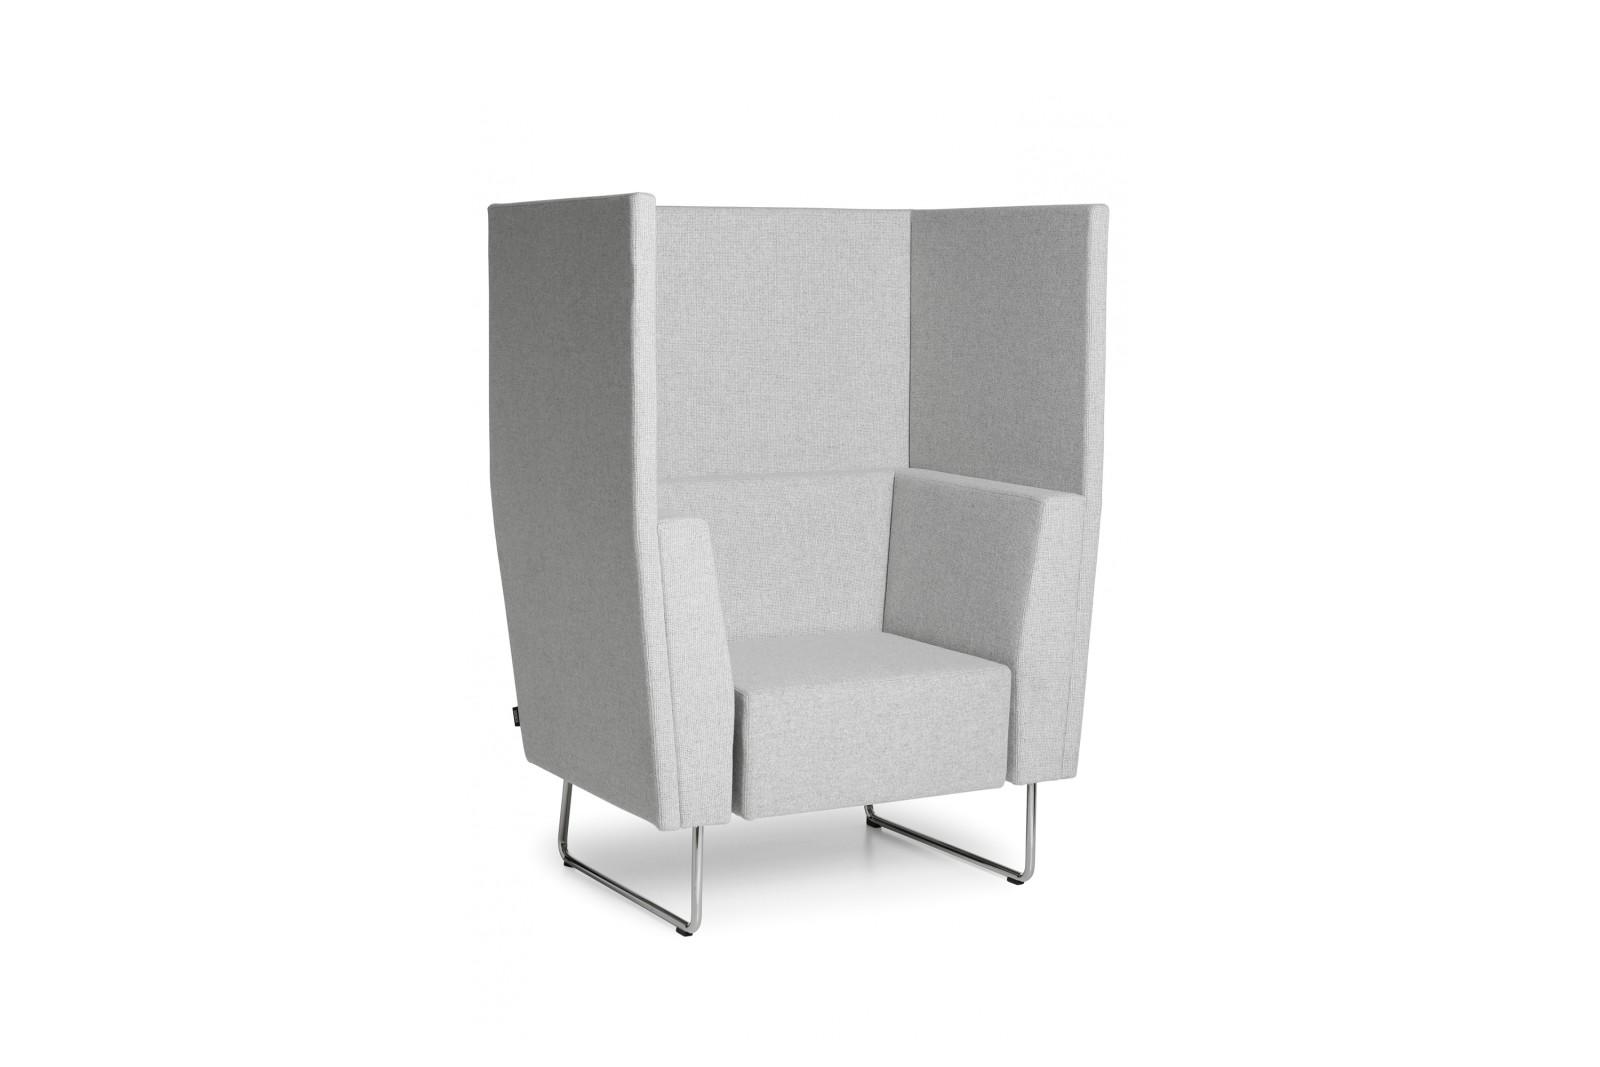 Gap Meeting Easy Chair White Steel, Main Line Flax Newbury